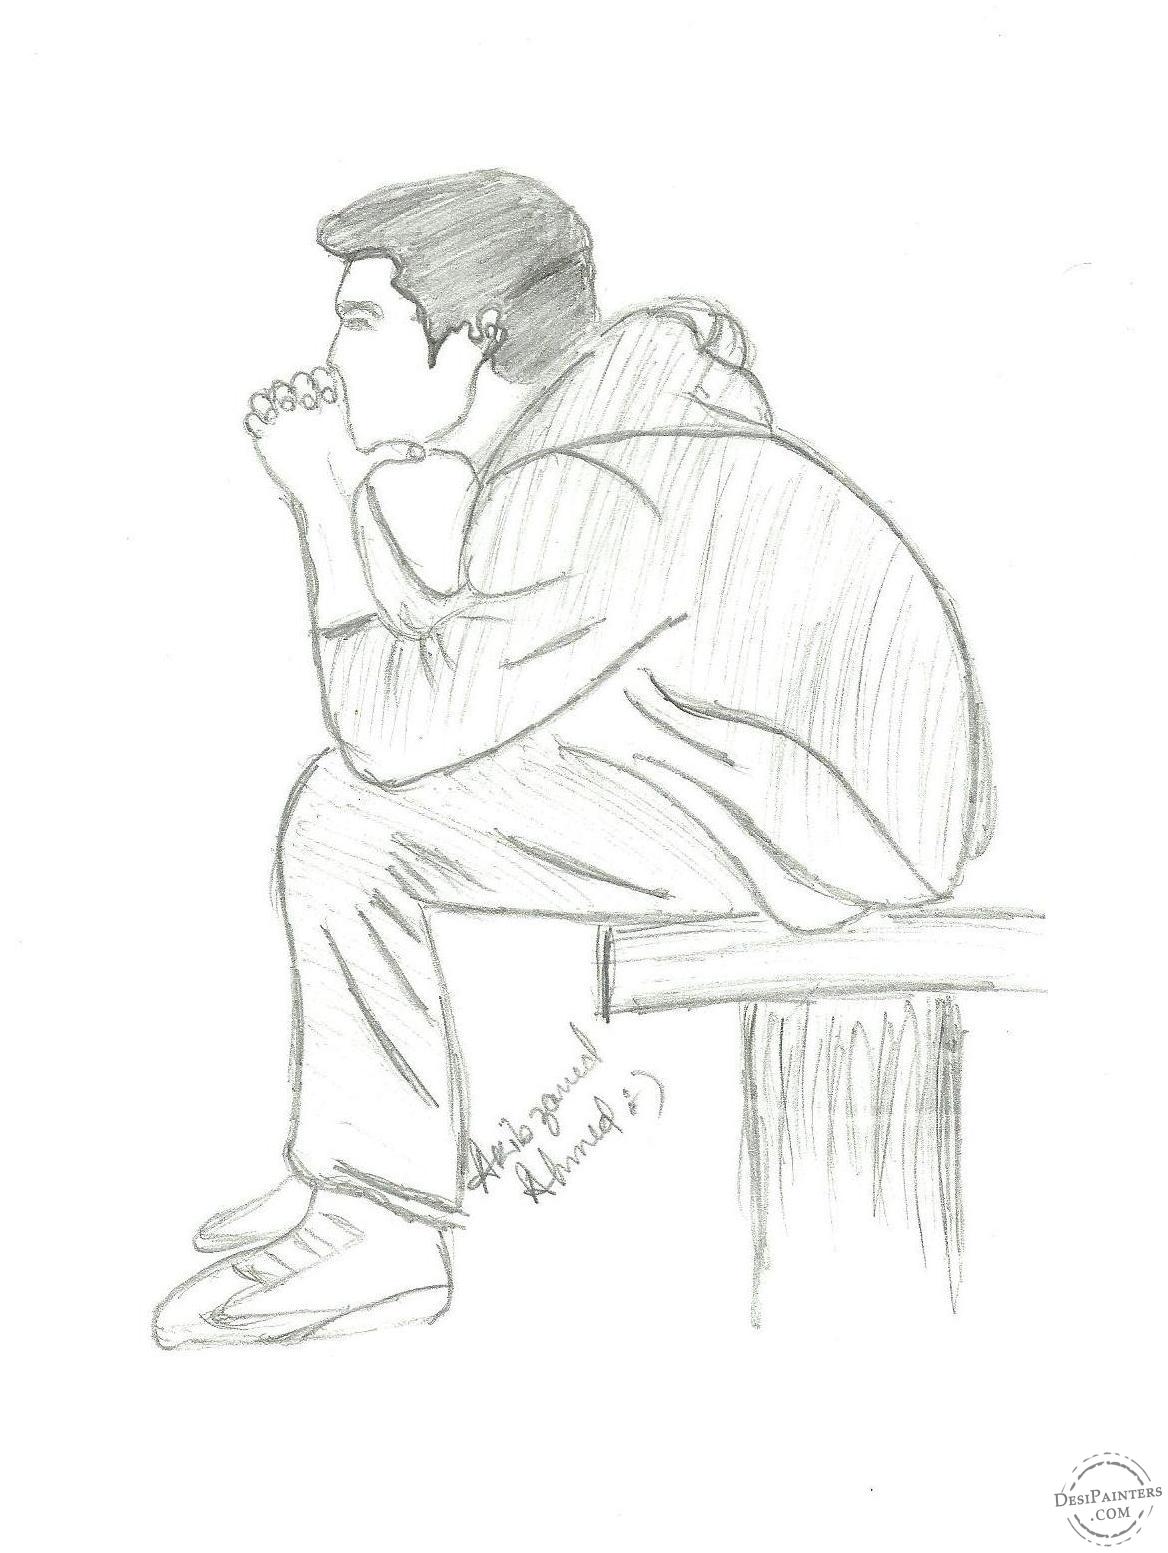 1168x1553 Pencil Sketching Of Sad Boy Pencil Drawings Of Lonely Boy